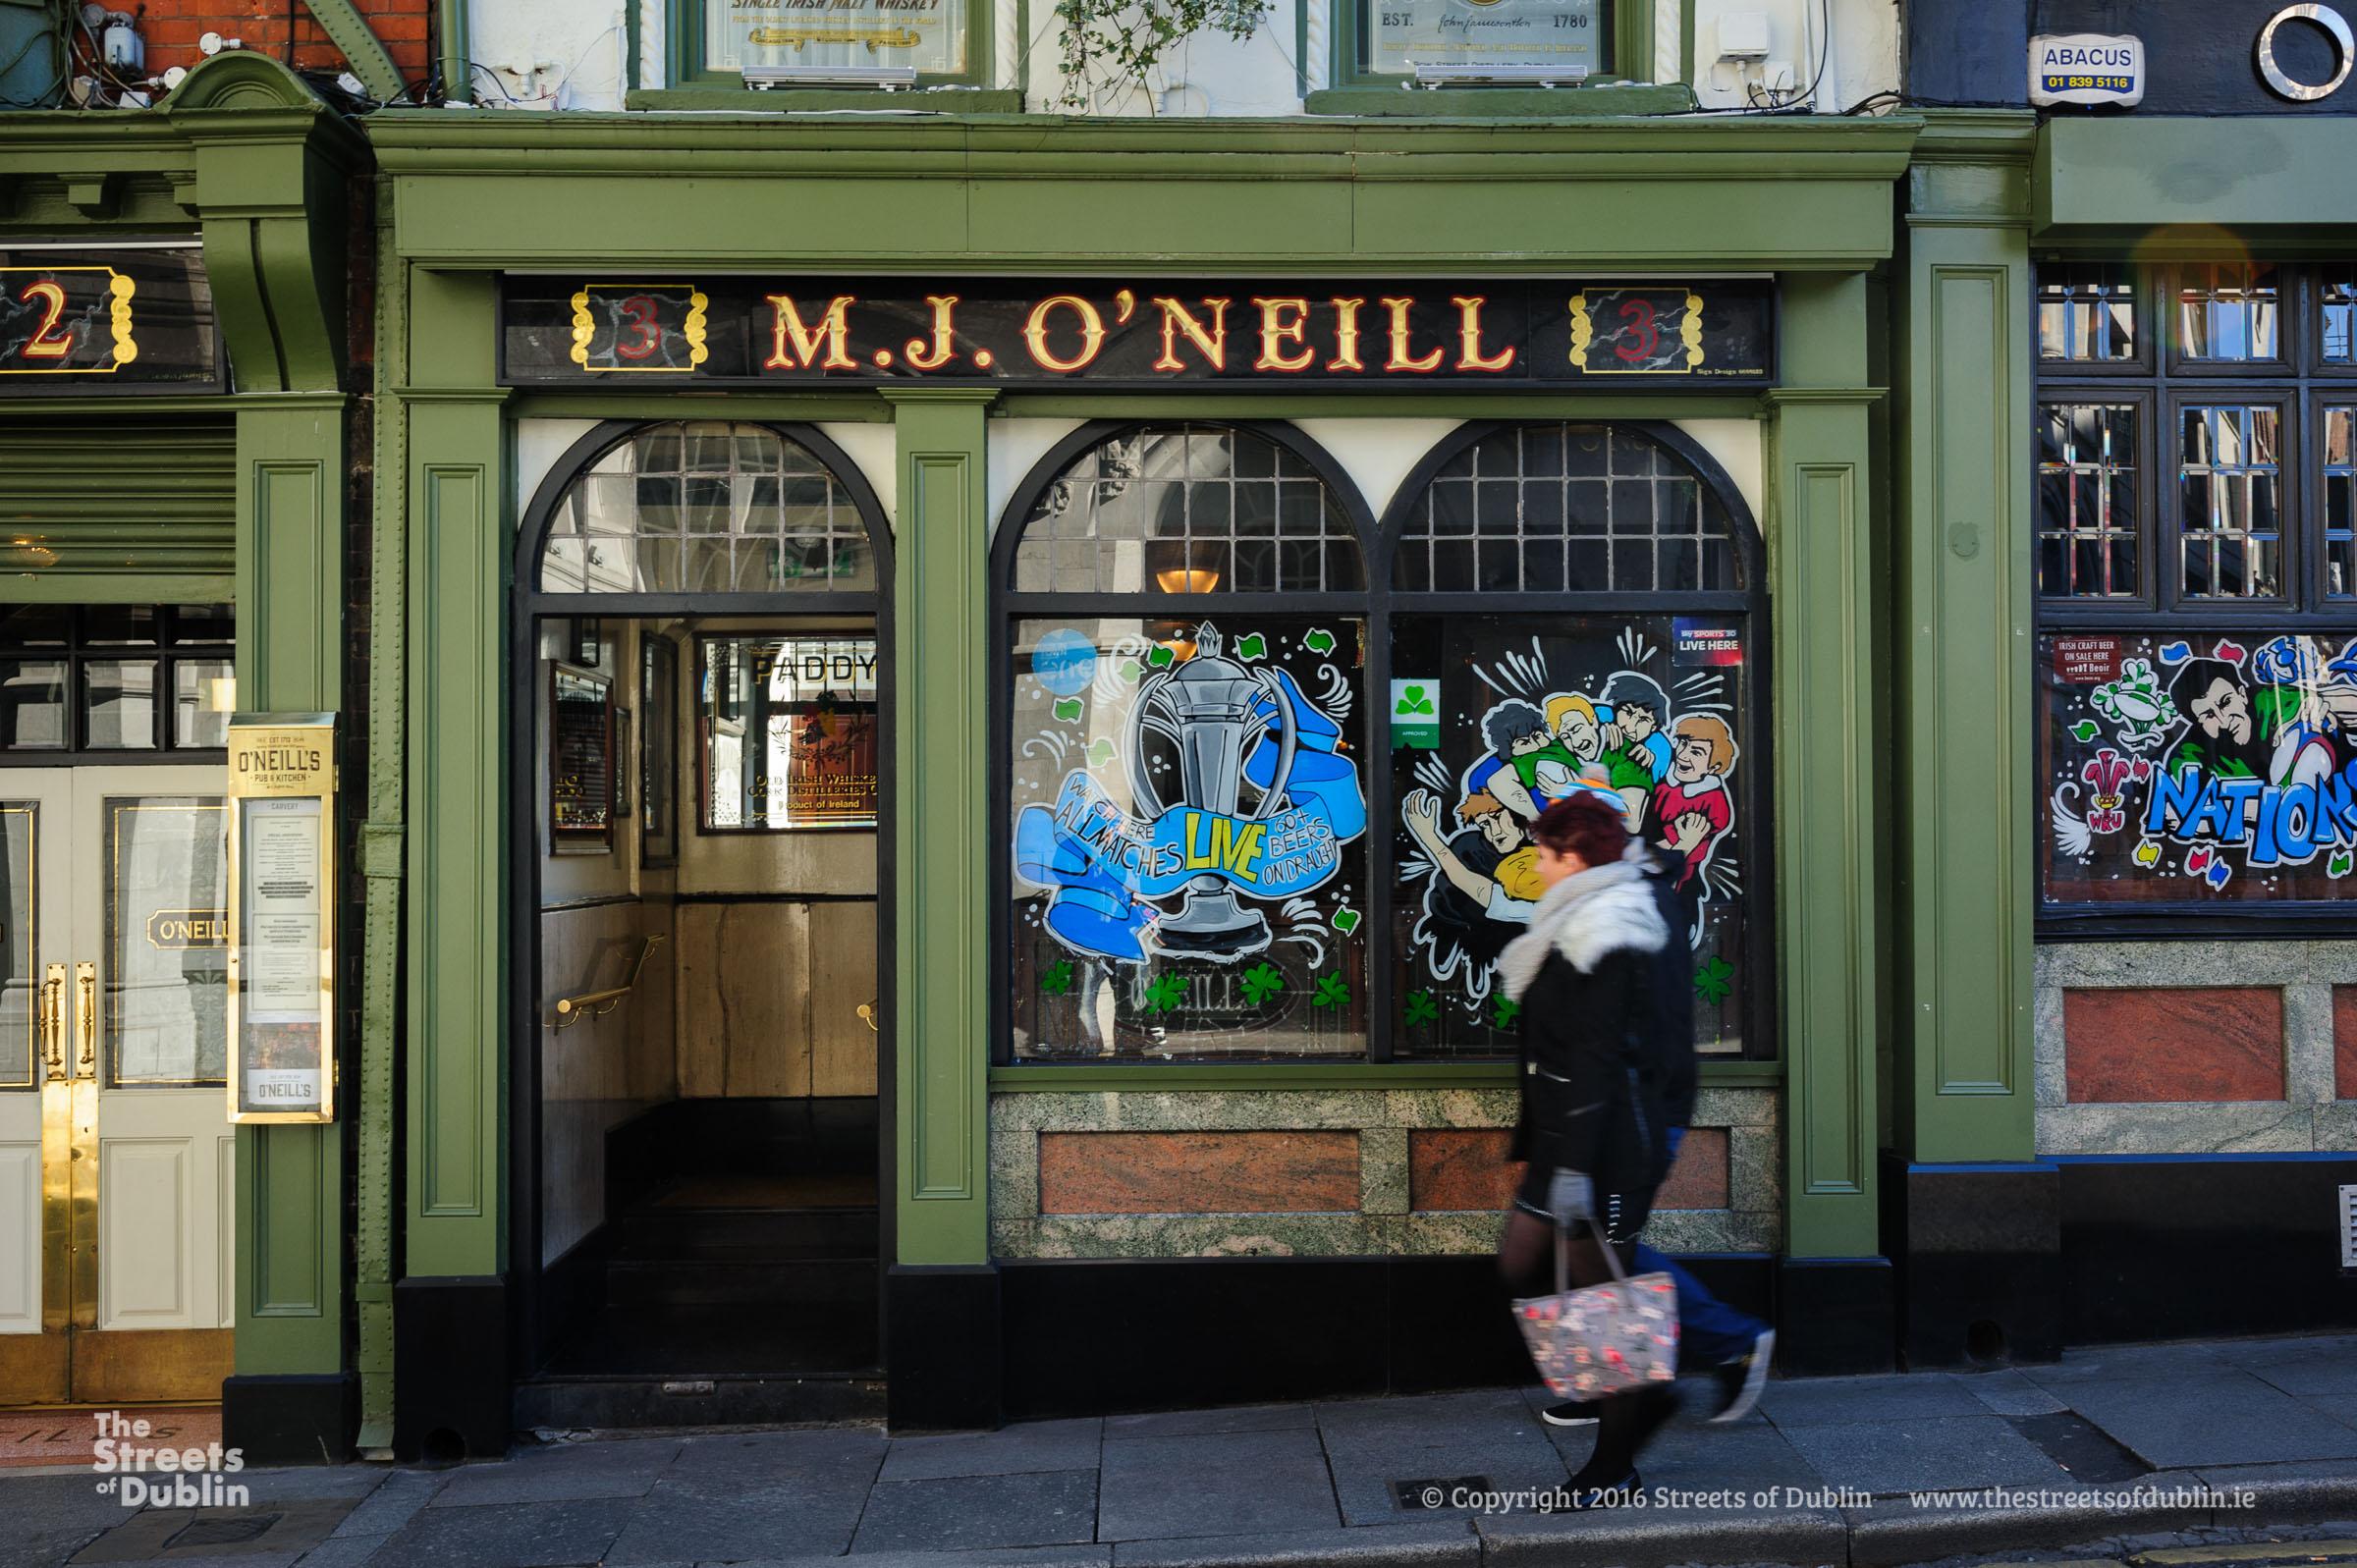 Streets-of-Dublin-Photo-1402.jpg